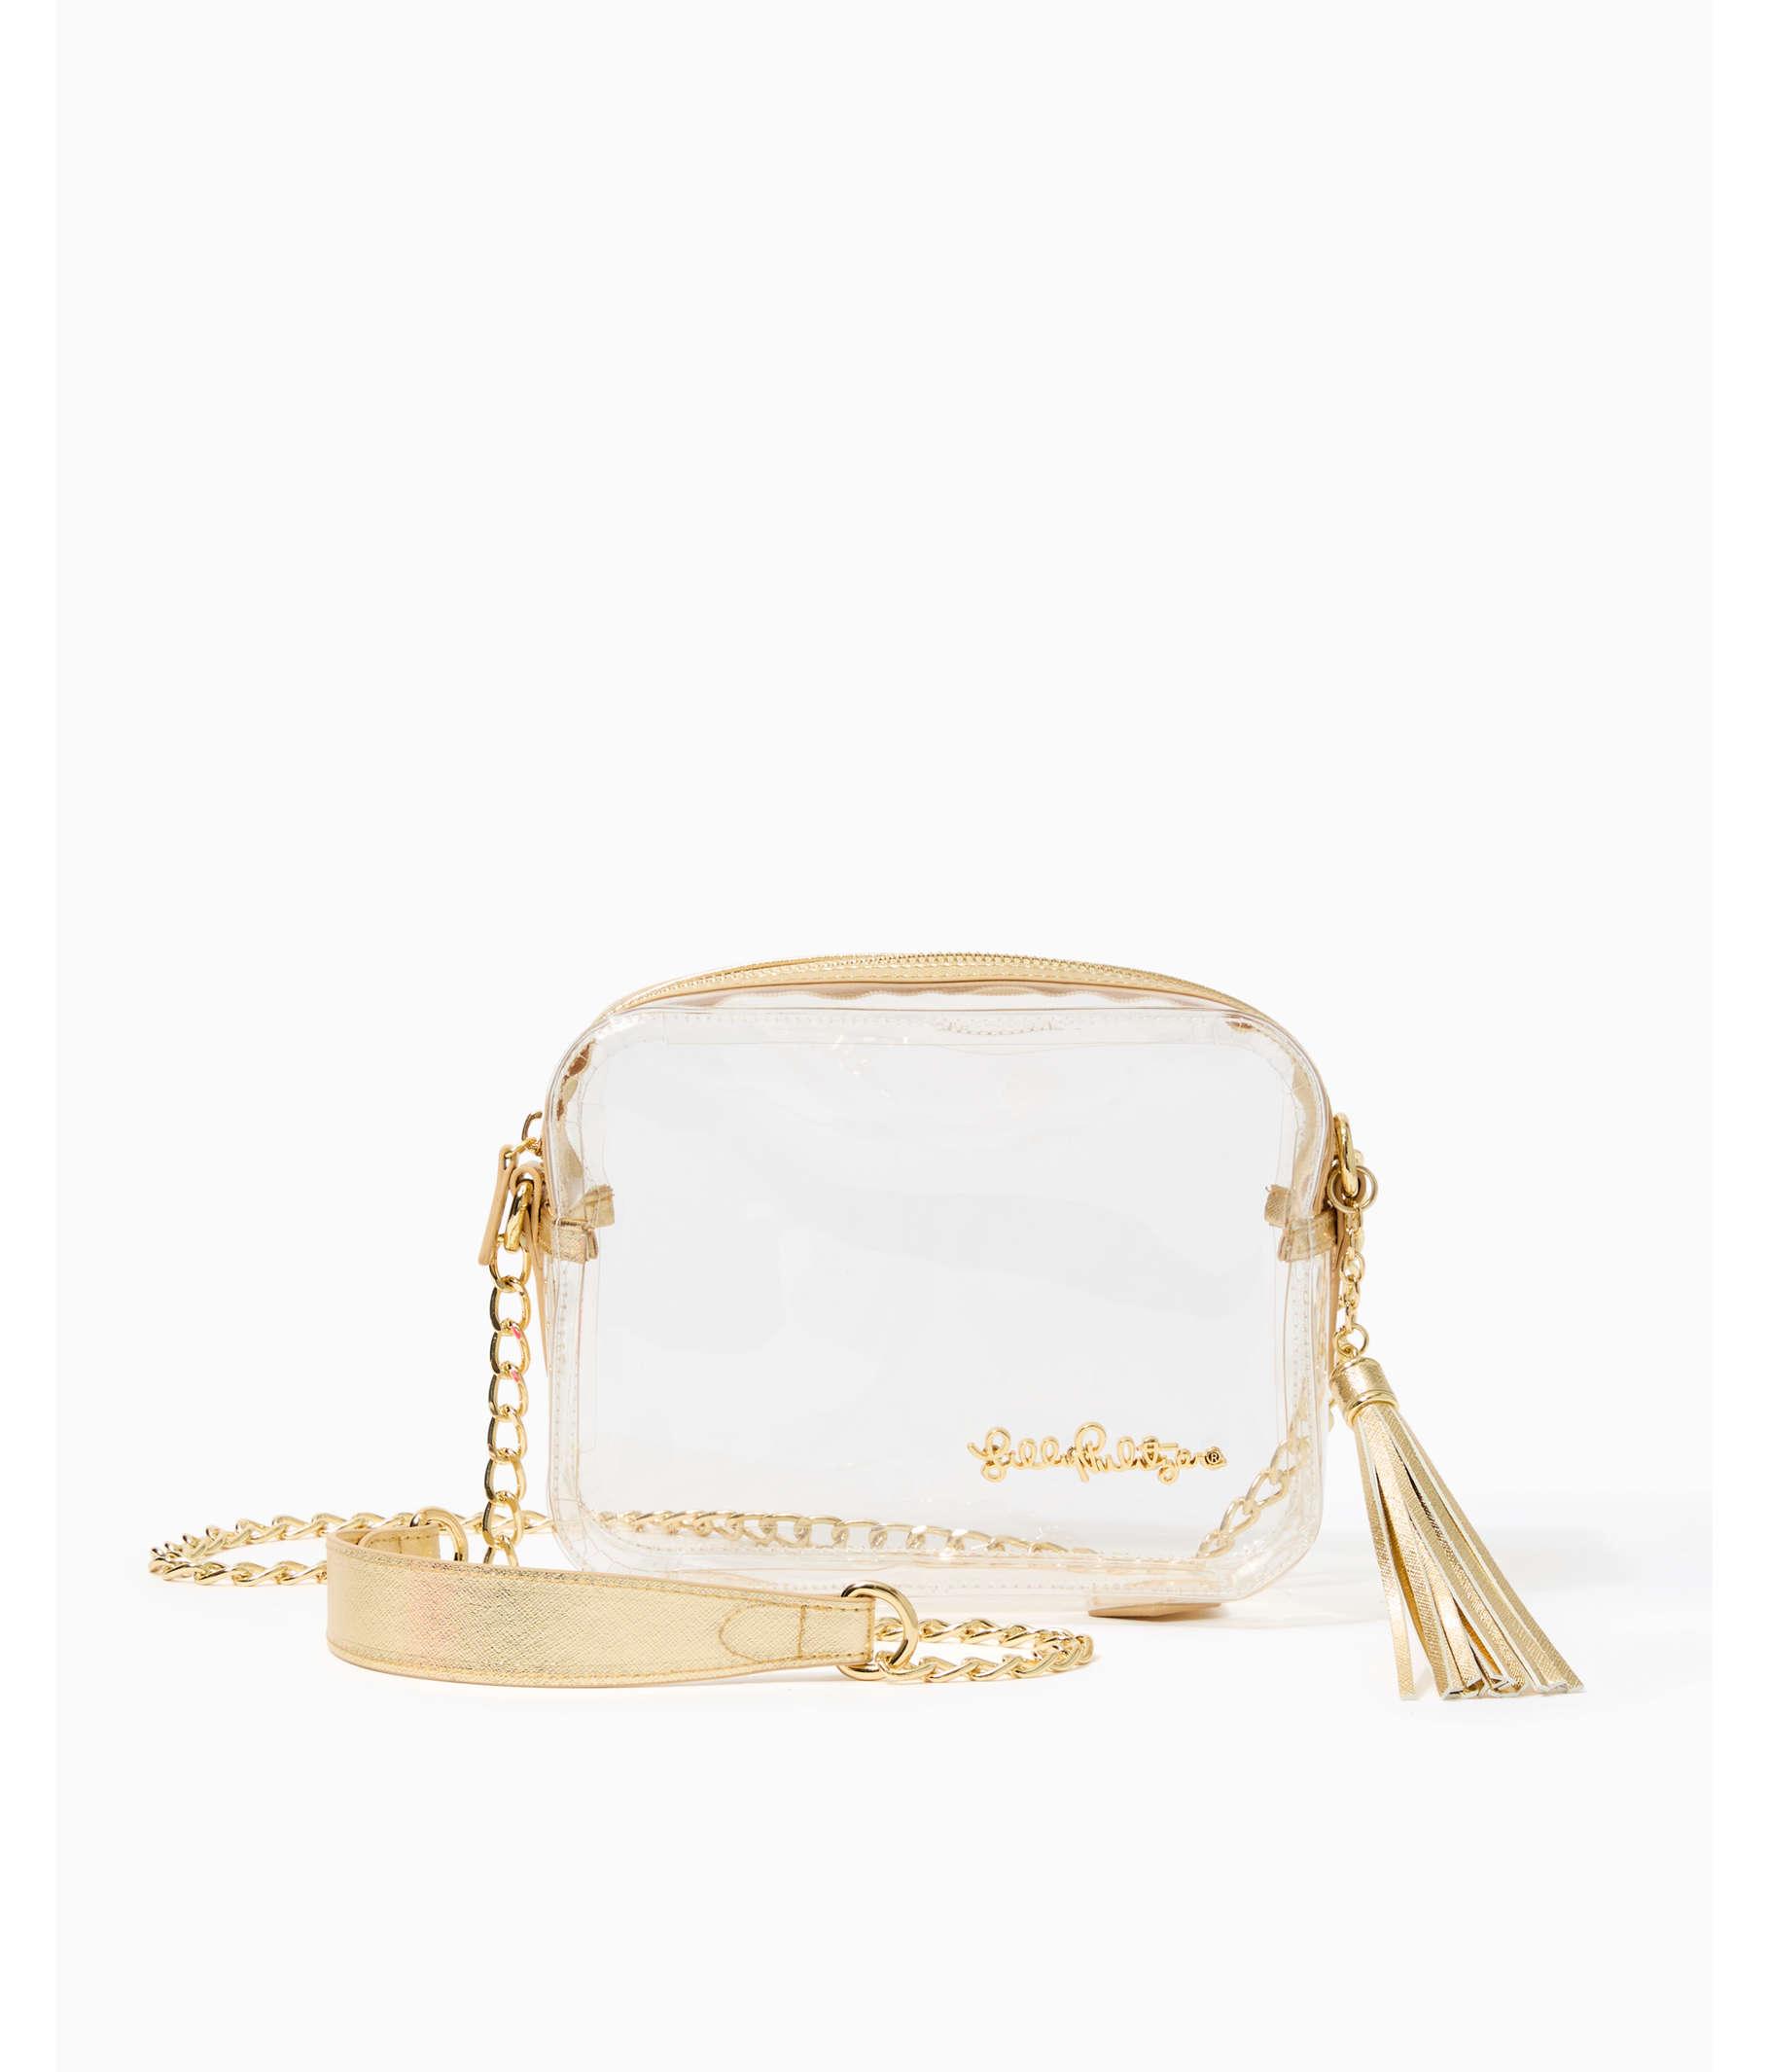 90bc4ba1f681 Clear Crossbody Bag